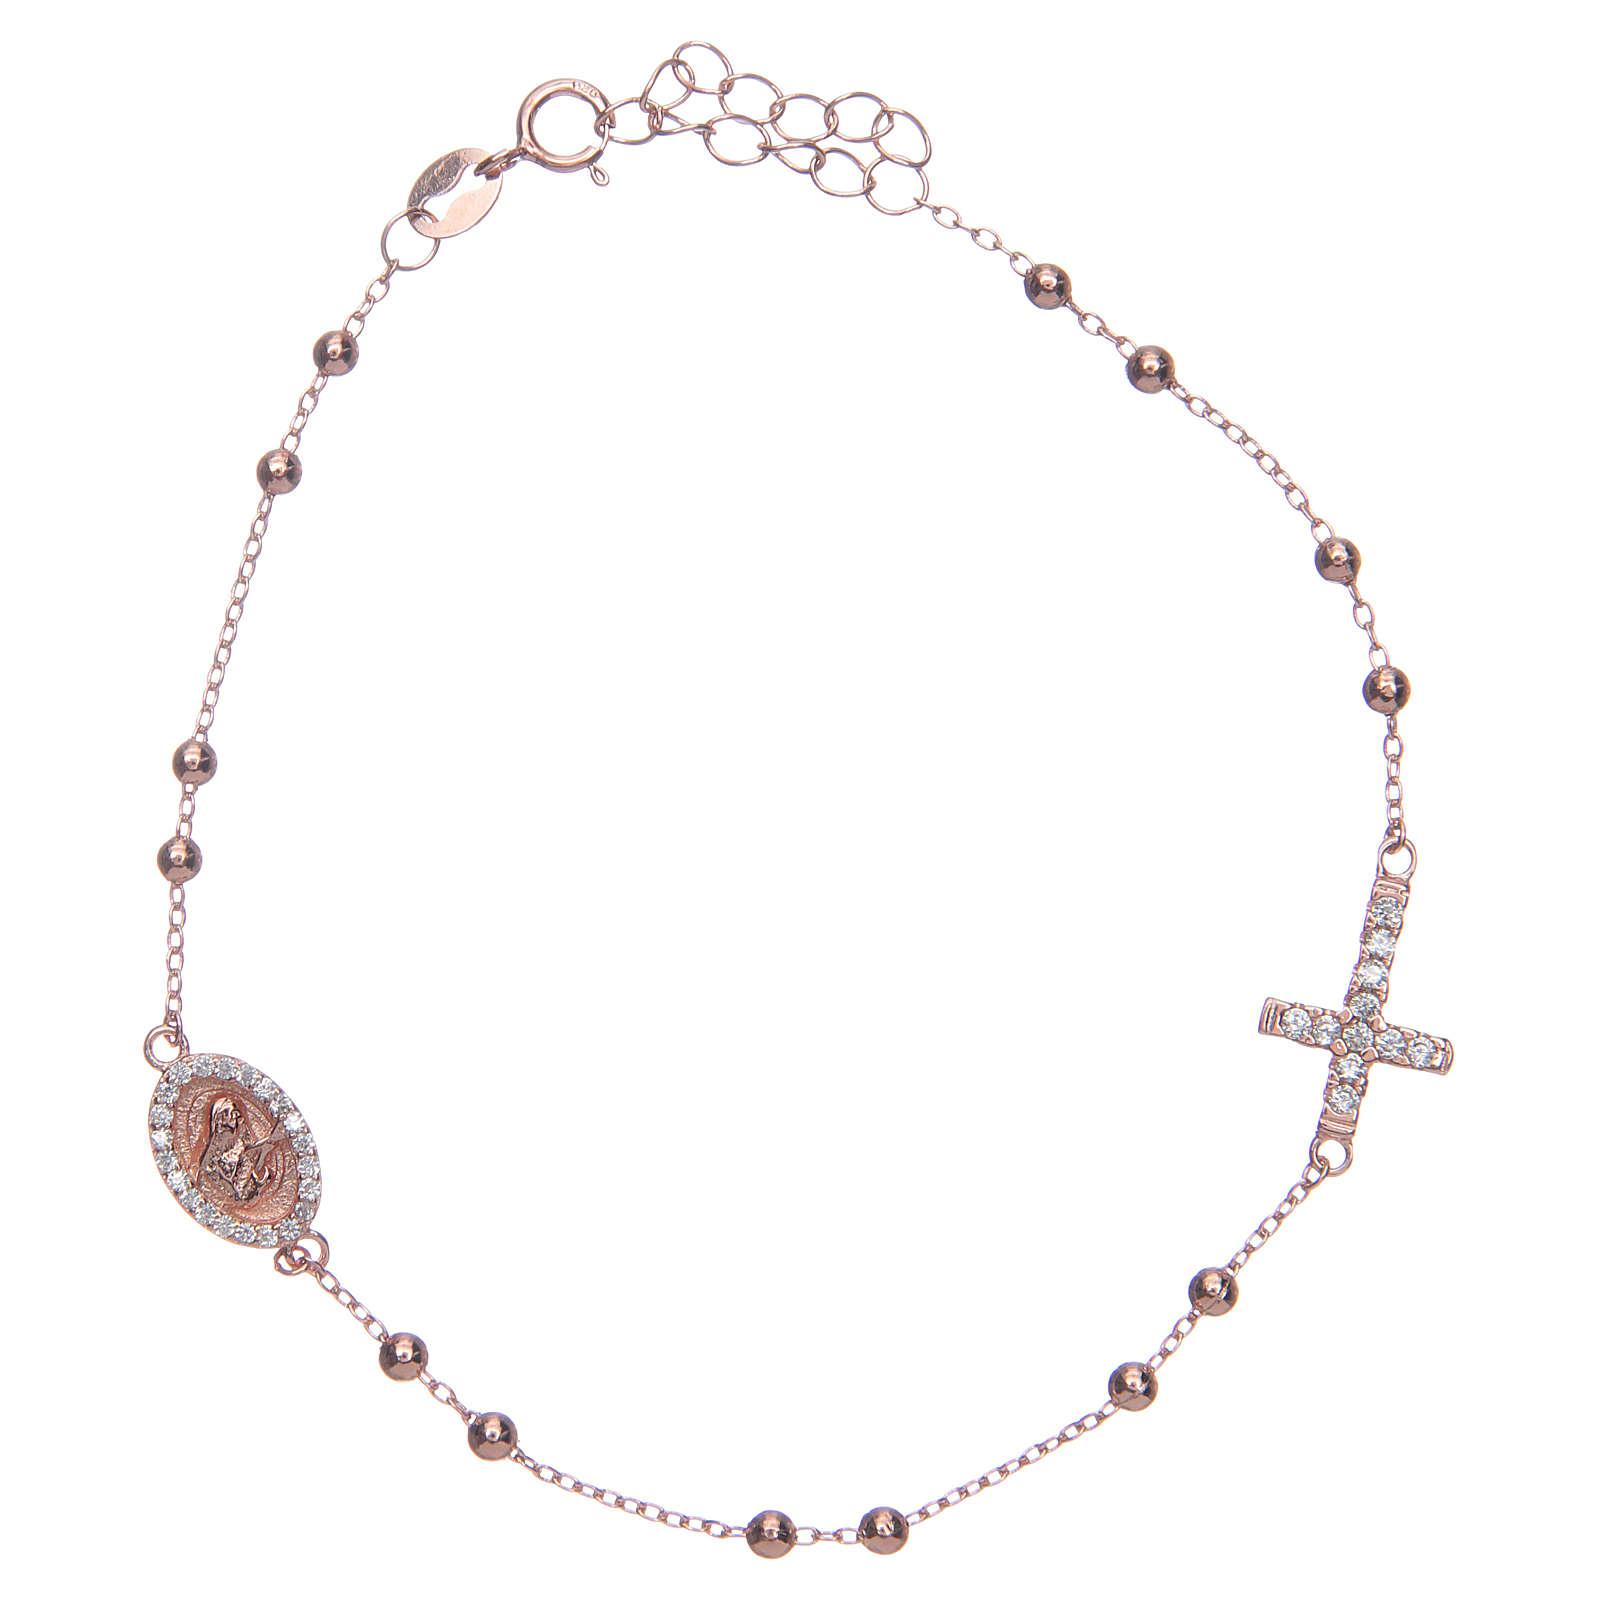 Bracciale rosario Santa Rita rosé zirconi bianchi argento 925 4